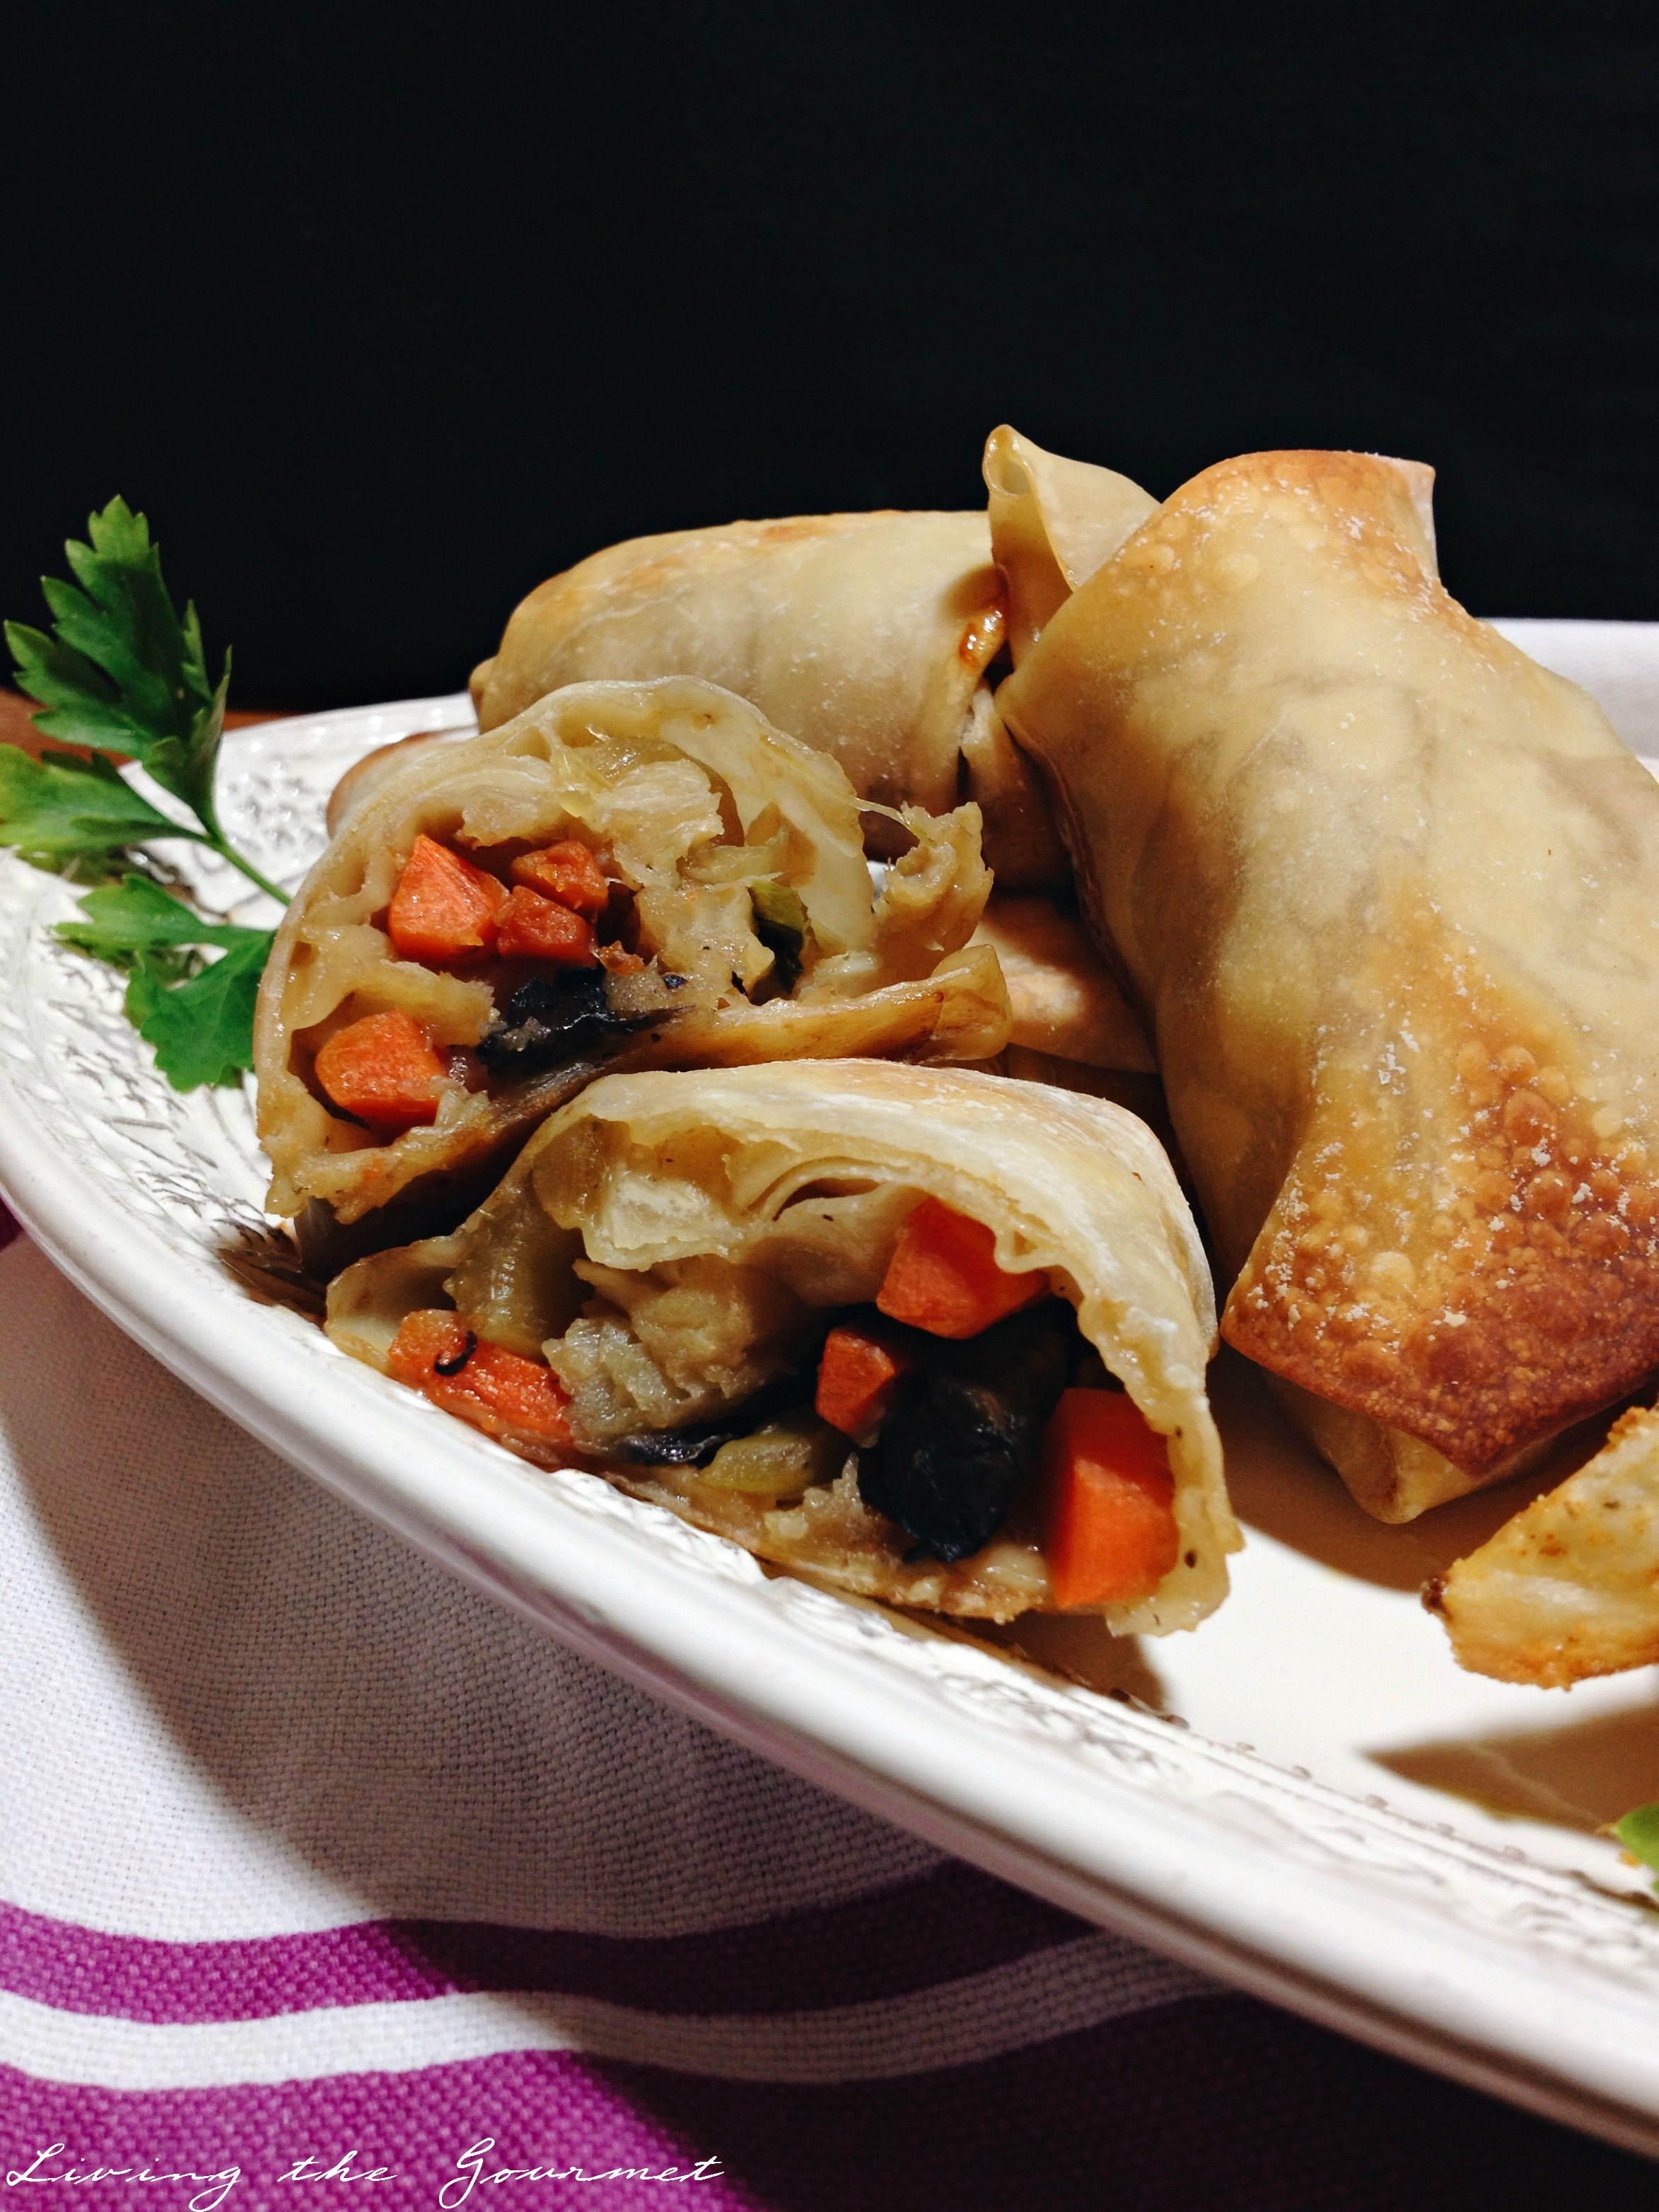 Living the Gourmet: Asian Beer Batter Fish Eggrolls & Chips